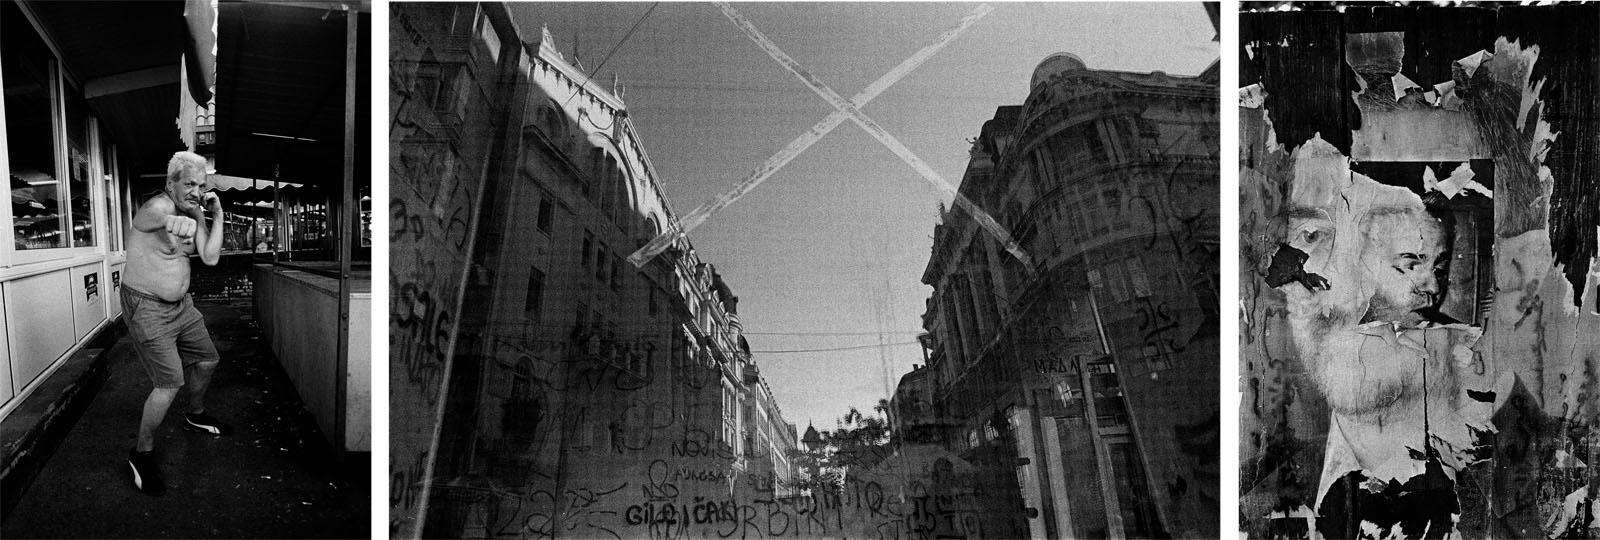 Art and Documentary Photography - Loading BGD___Fabio_Sgroi_014.jpg